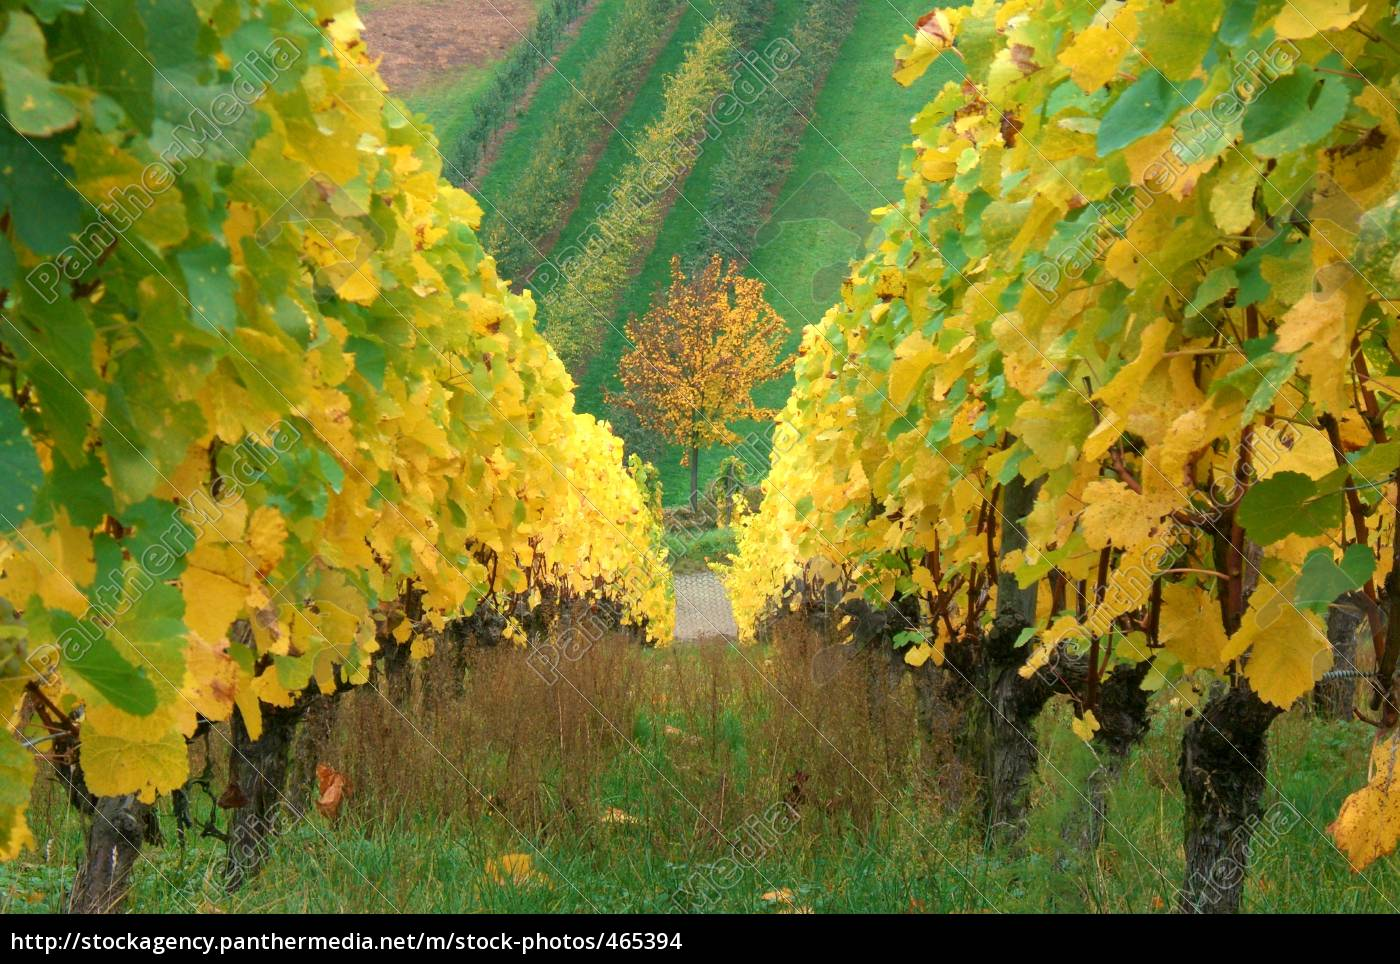 golden, autumn - 465394